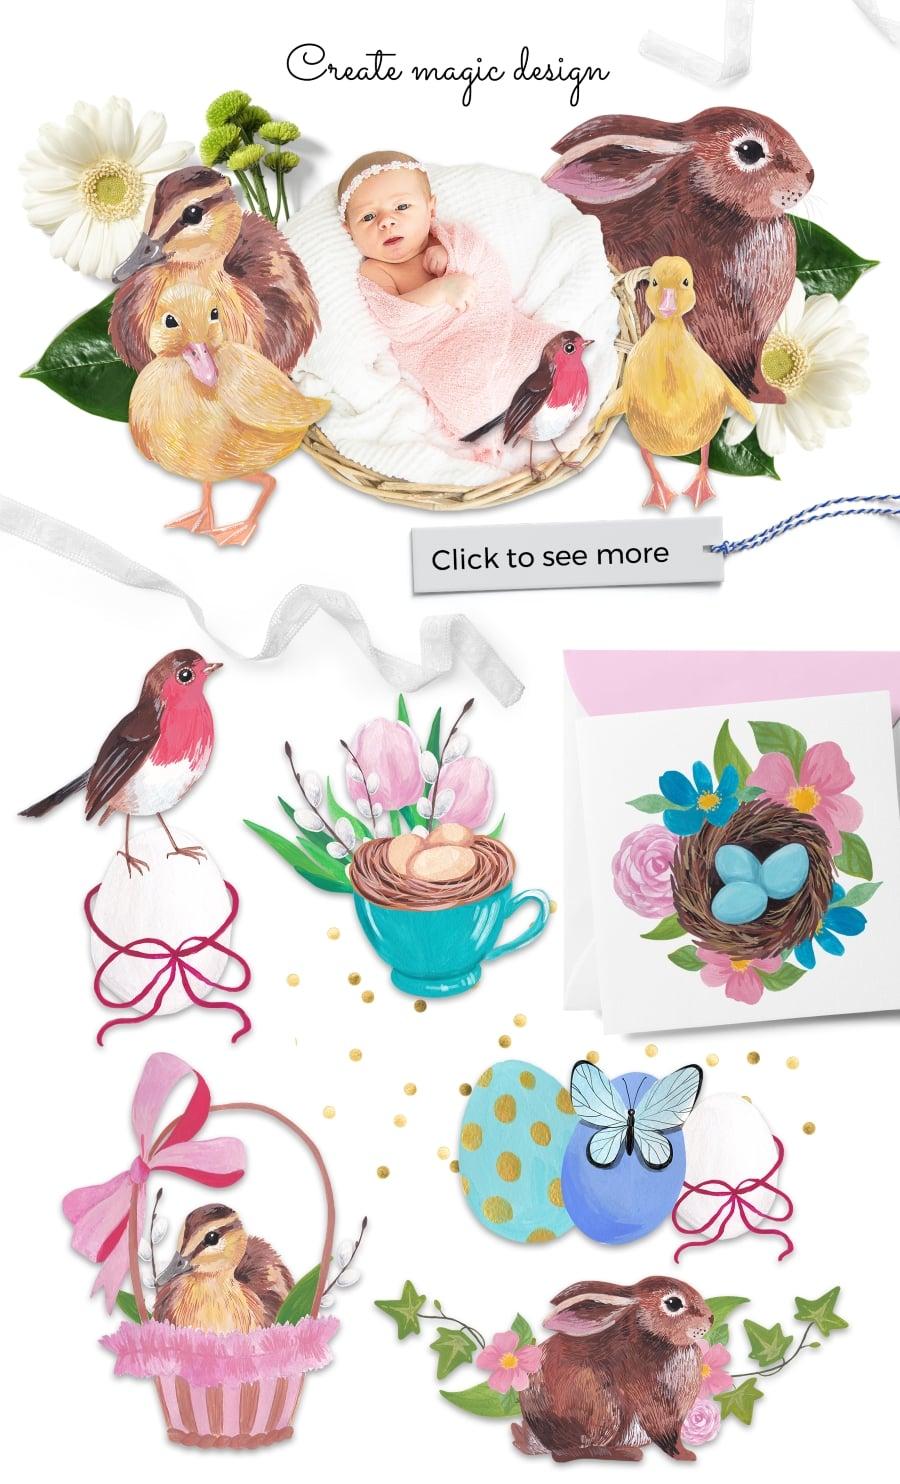 220 Best Easter Graphics in 2020: Free & Premium - cuties prev23